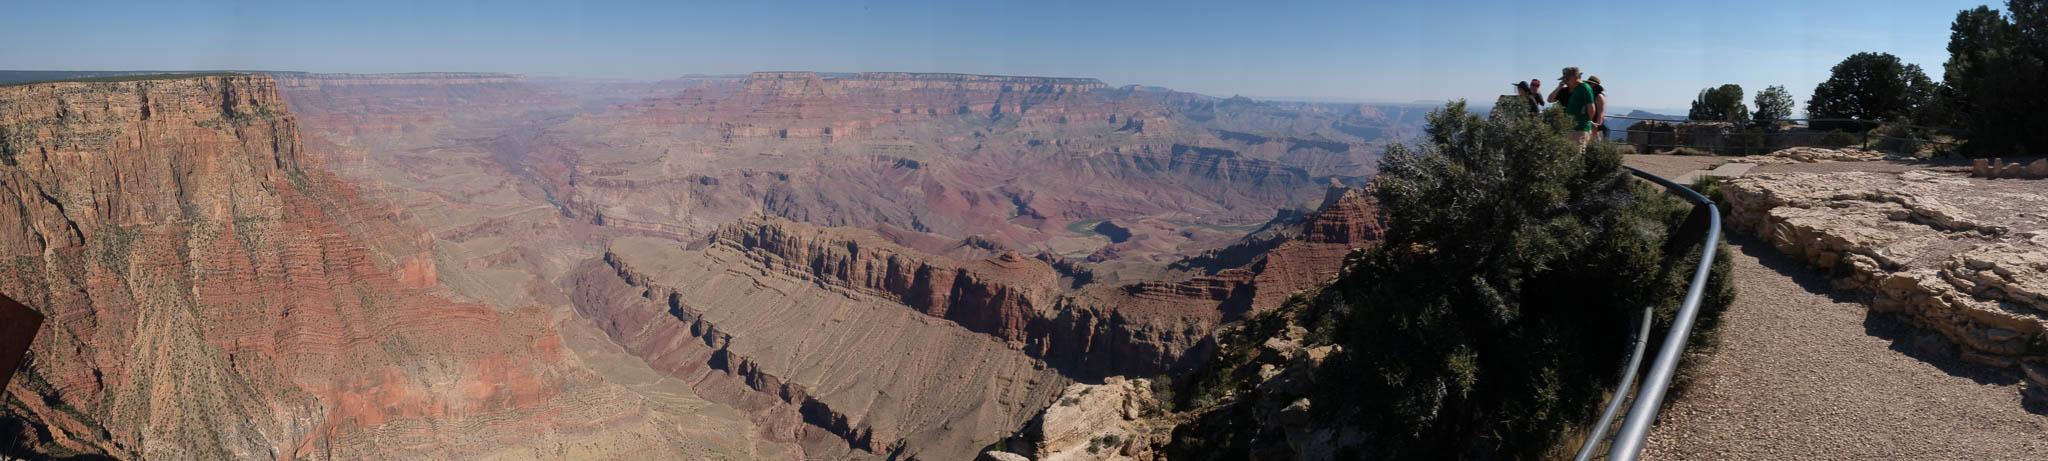 Grand Canyon-2017-7874.jpg